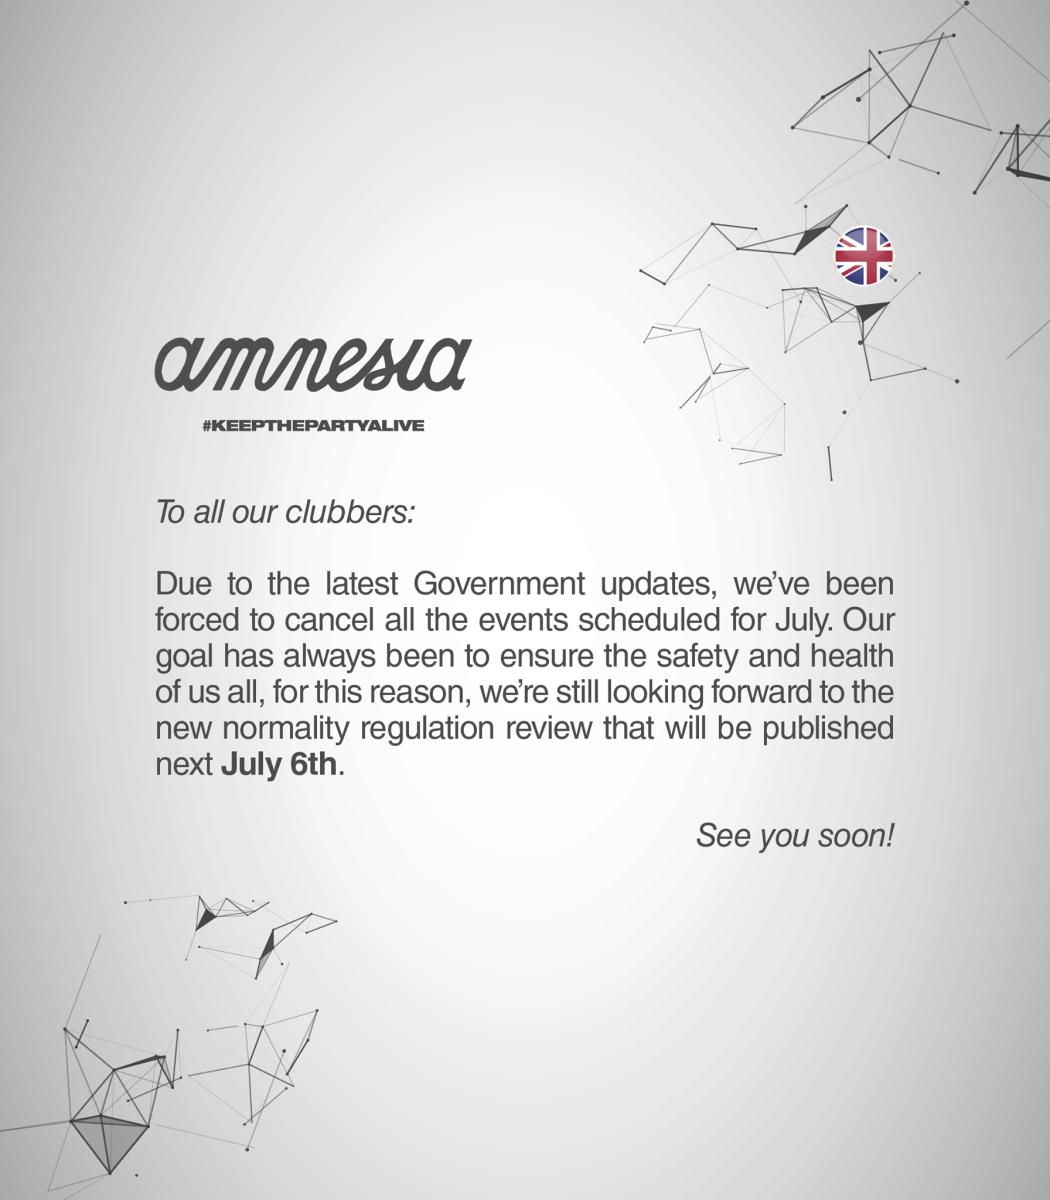 Amnesia Ibiza statement